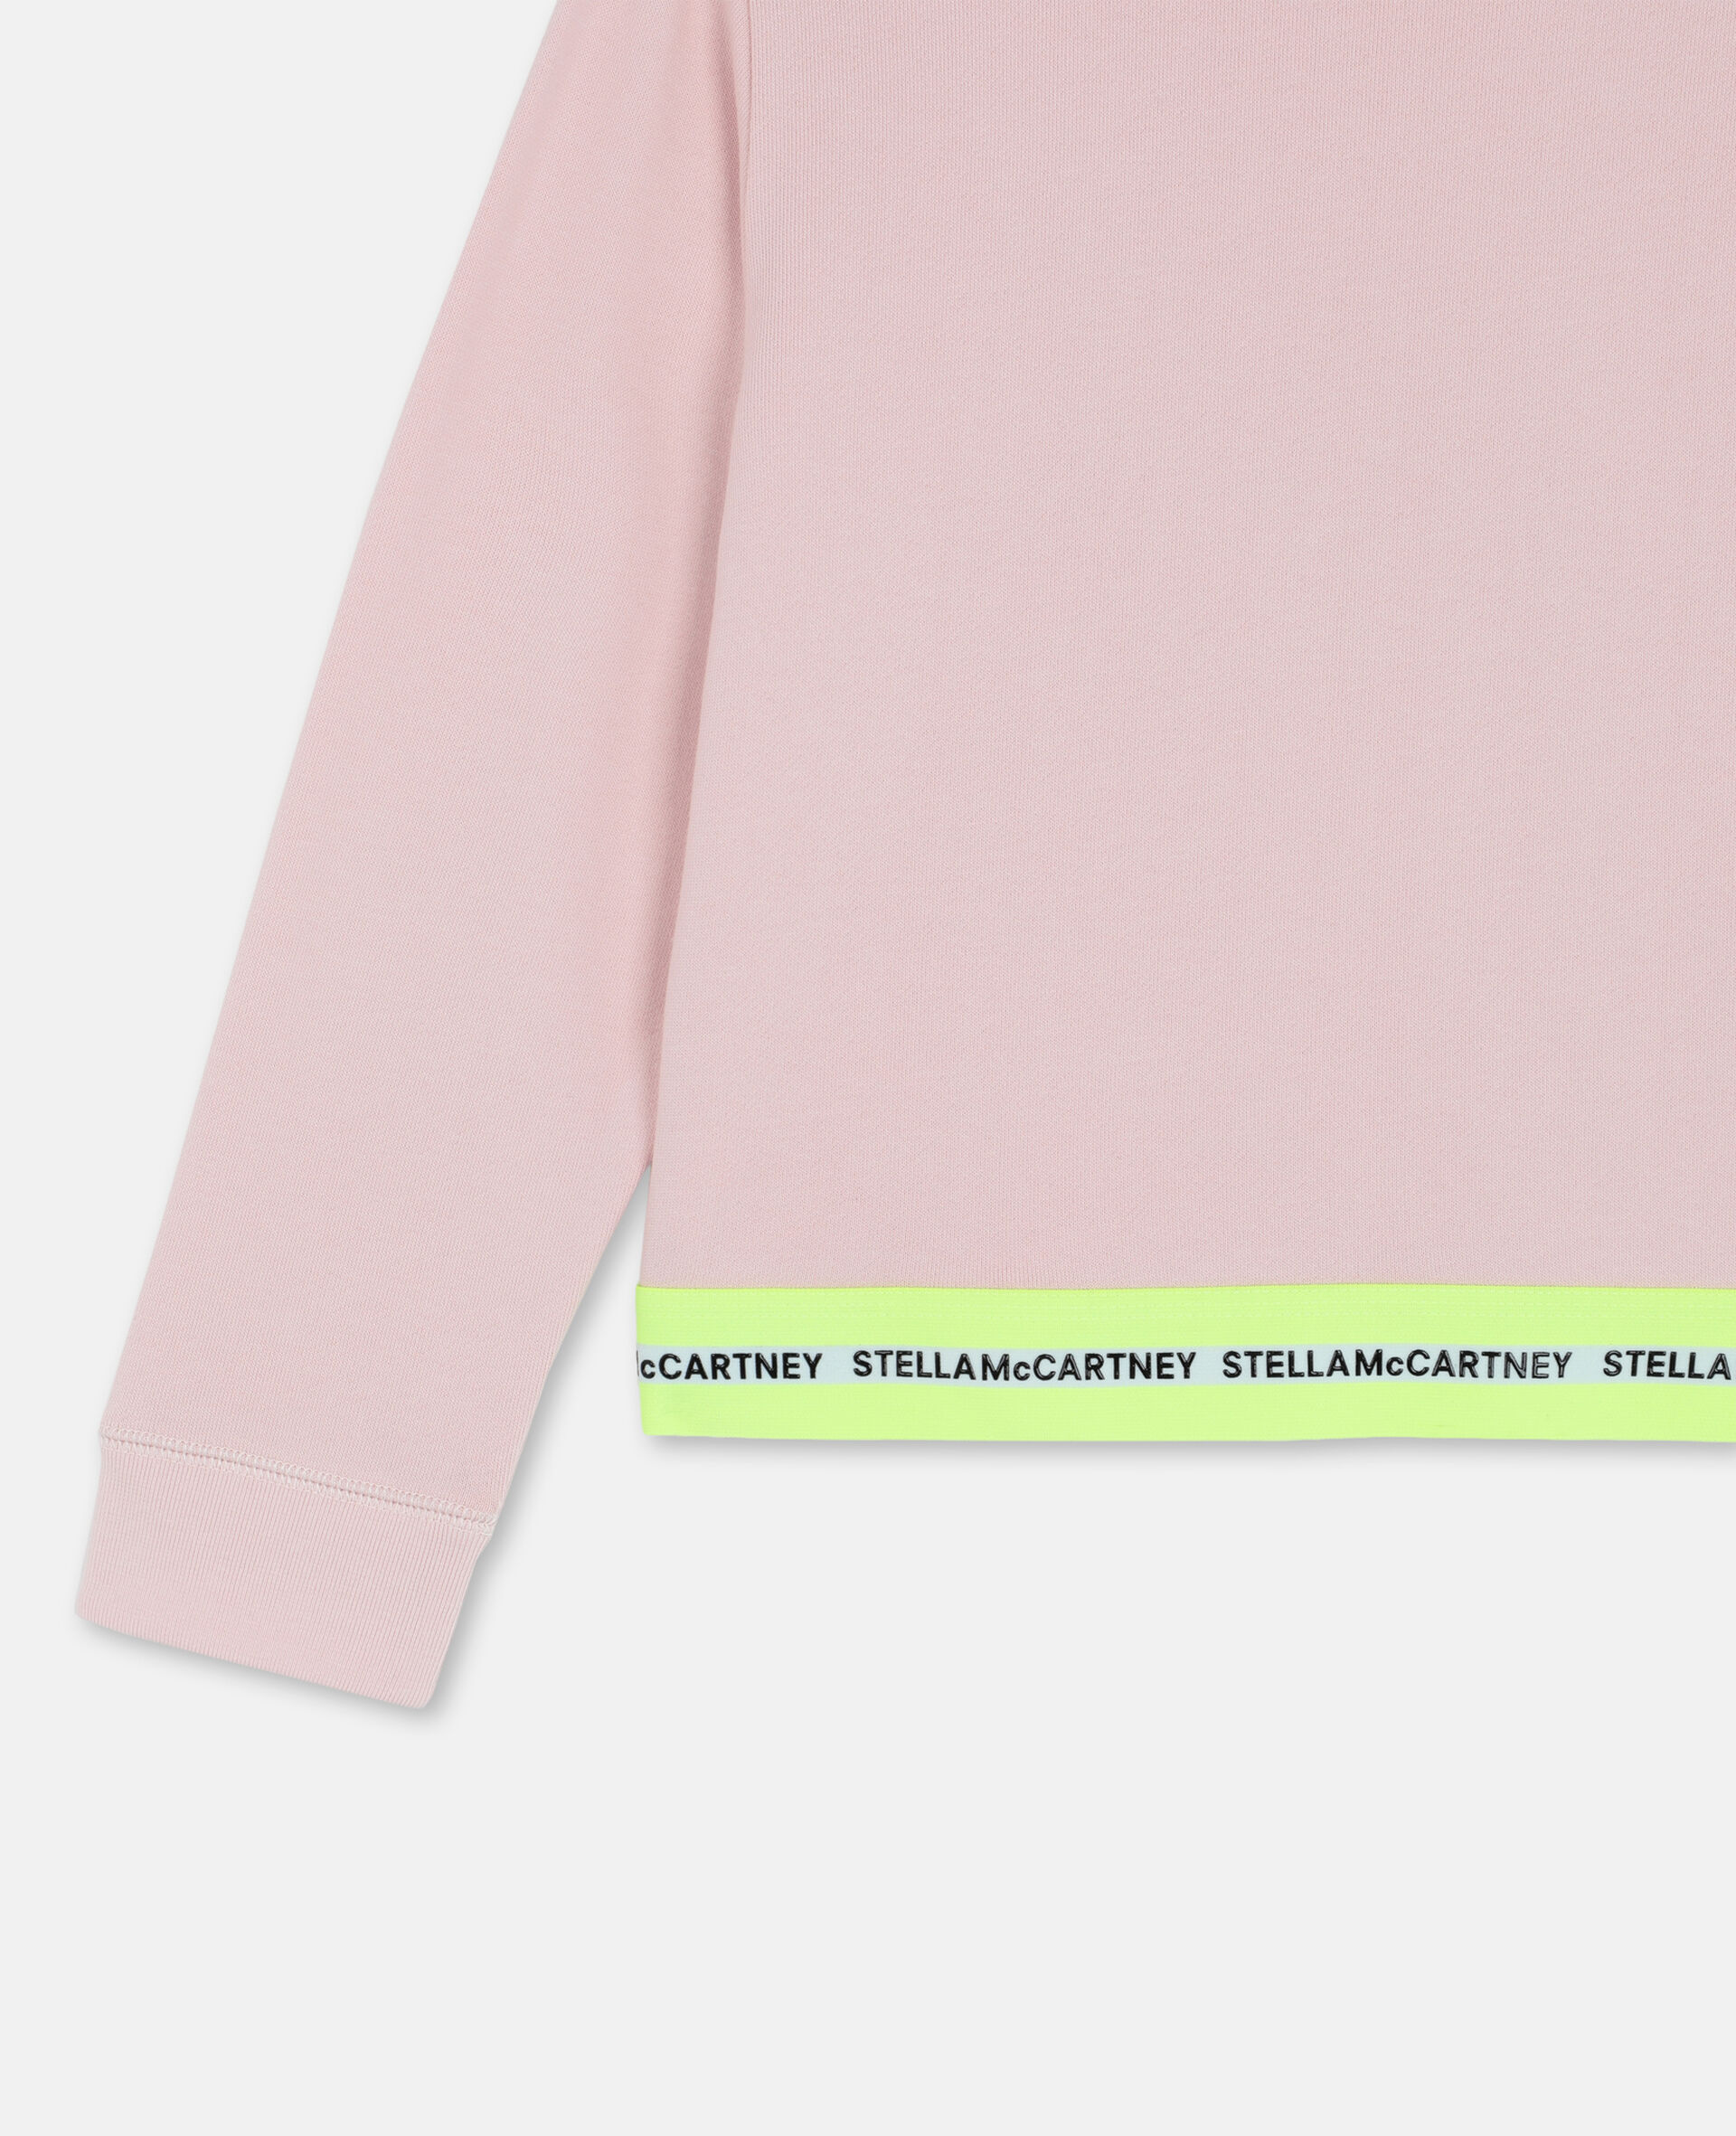 Sportliches Baumwollfleece-Sweatshirt mit Logo-Rose-large image number 2